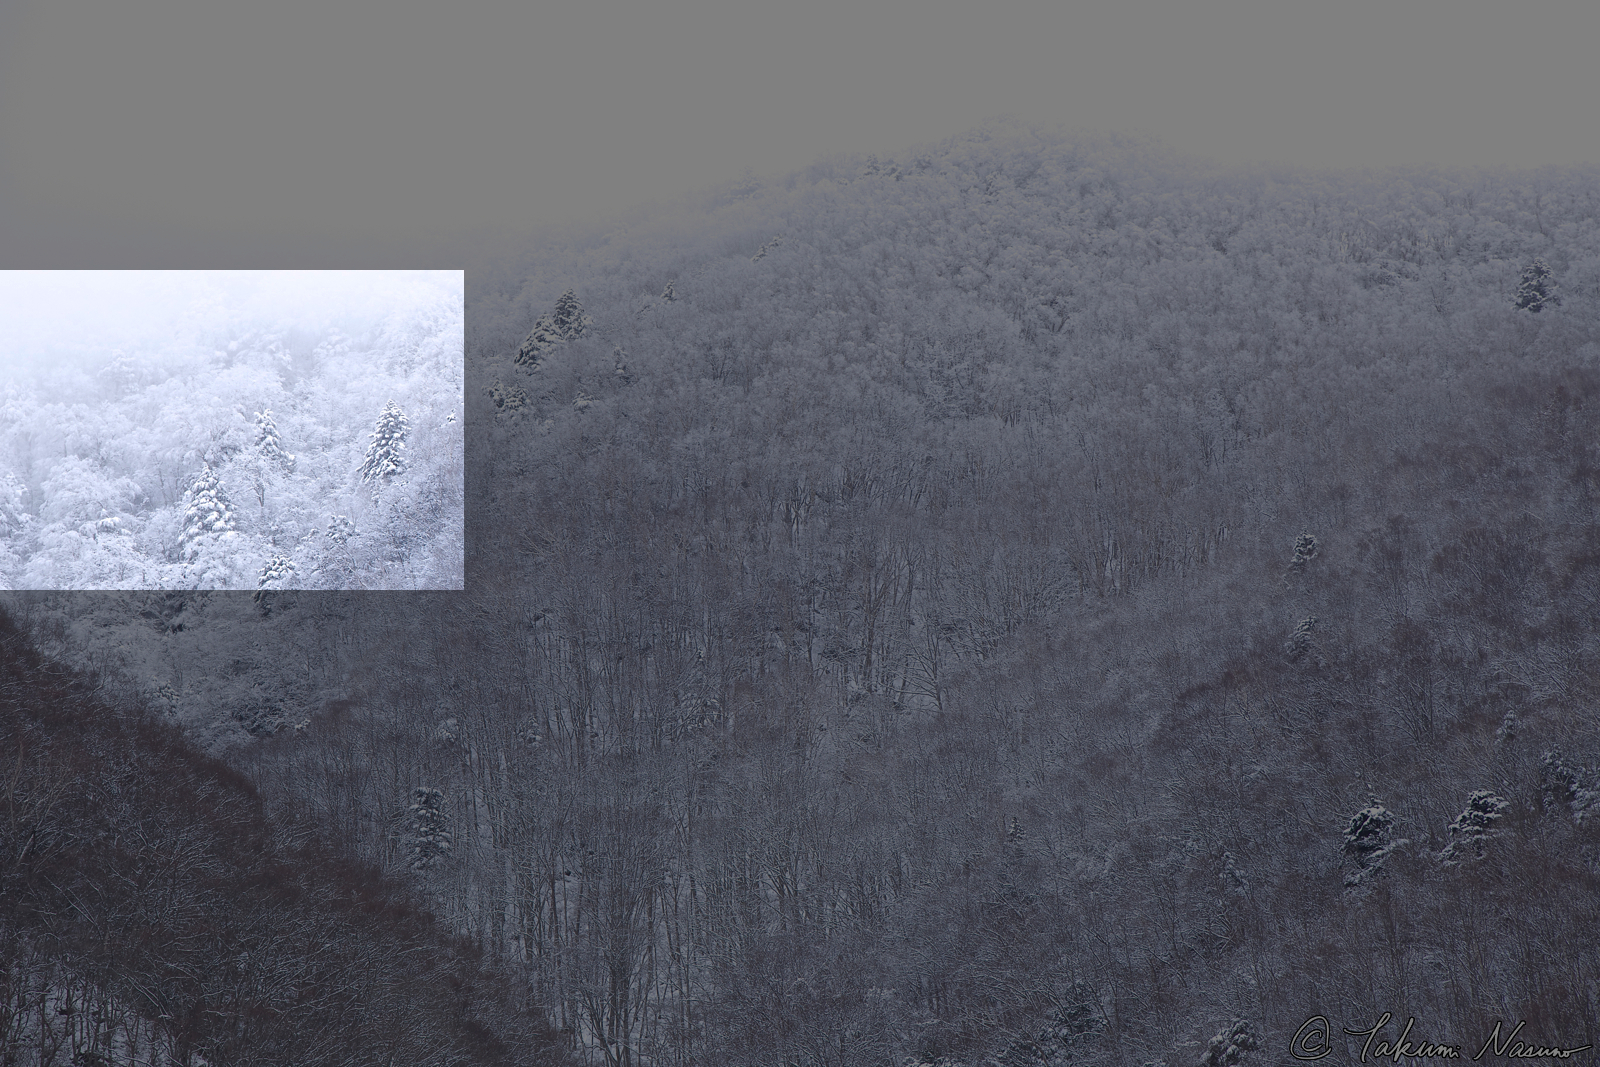 snowy-mountains-of-takayama-village_pointed